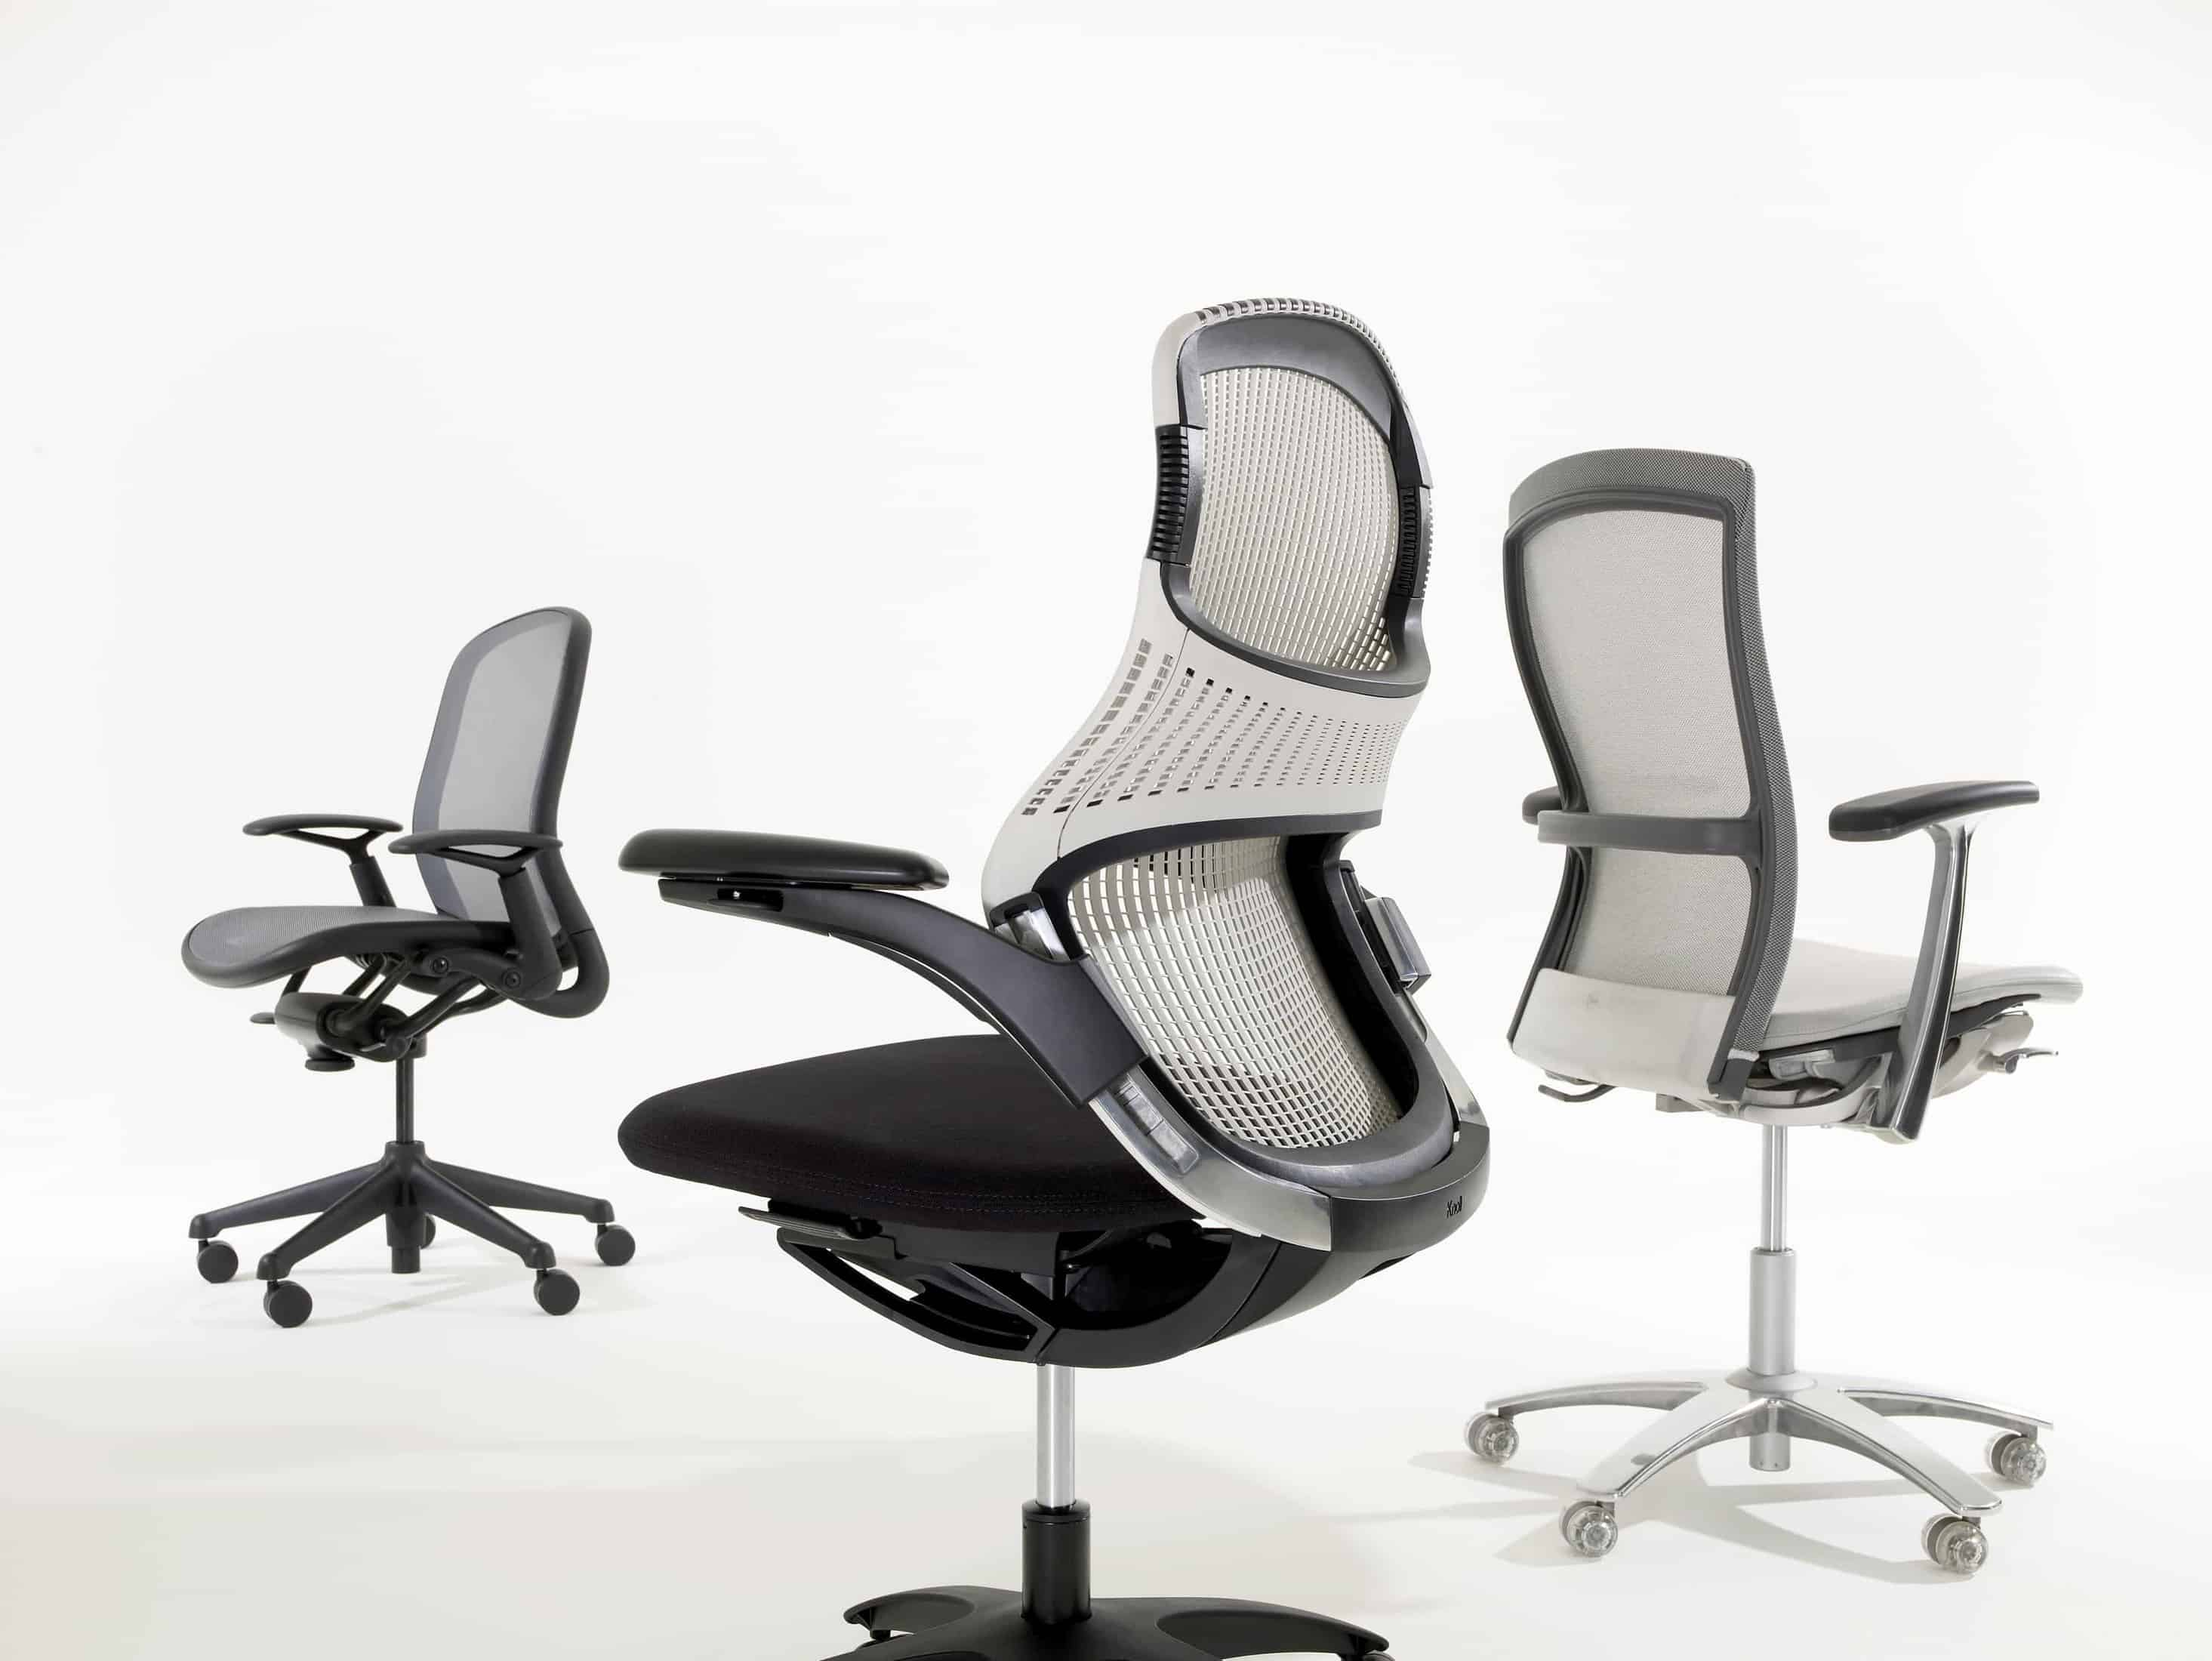 The Ergonomic fice Furniture Advantage SEO Website Links